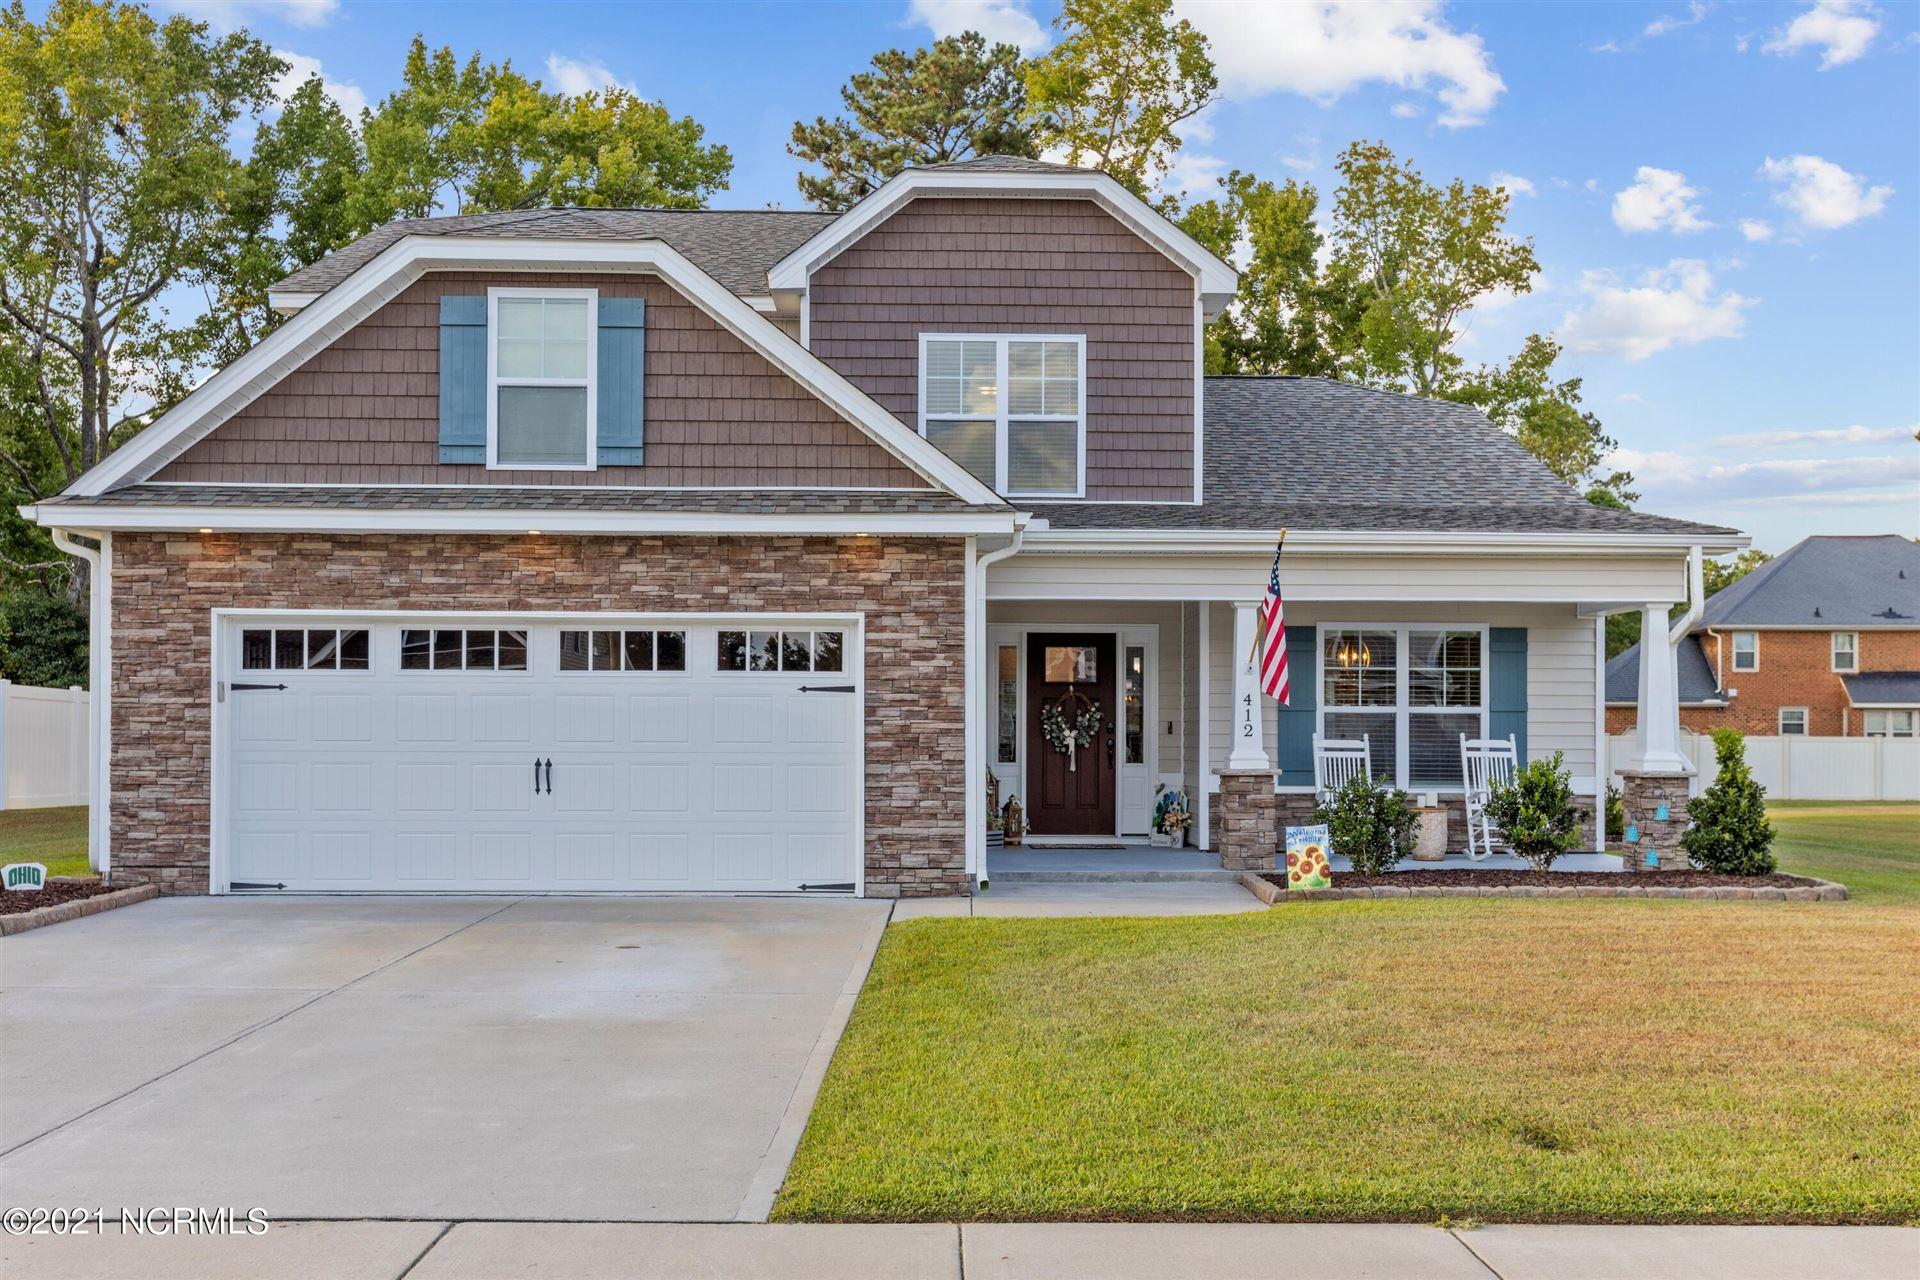 Photo of 412 Cheltenham Drive, Greenville, NC 27834 (MLS # 100291177)